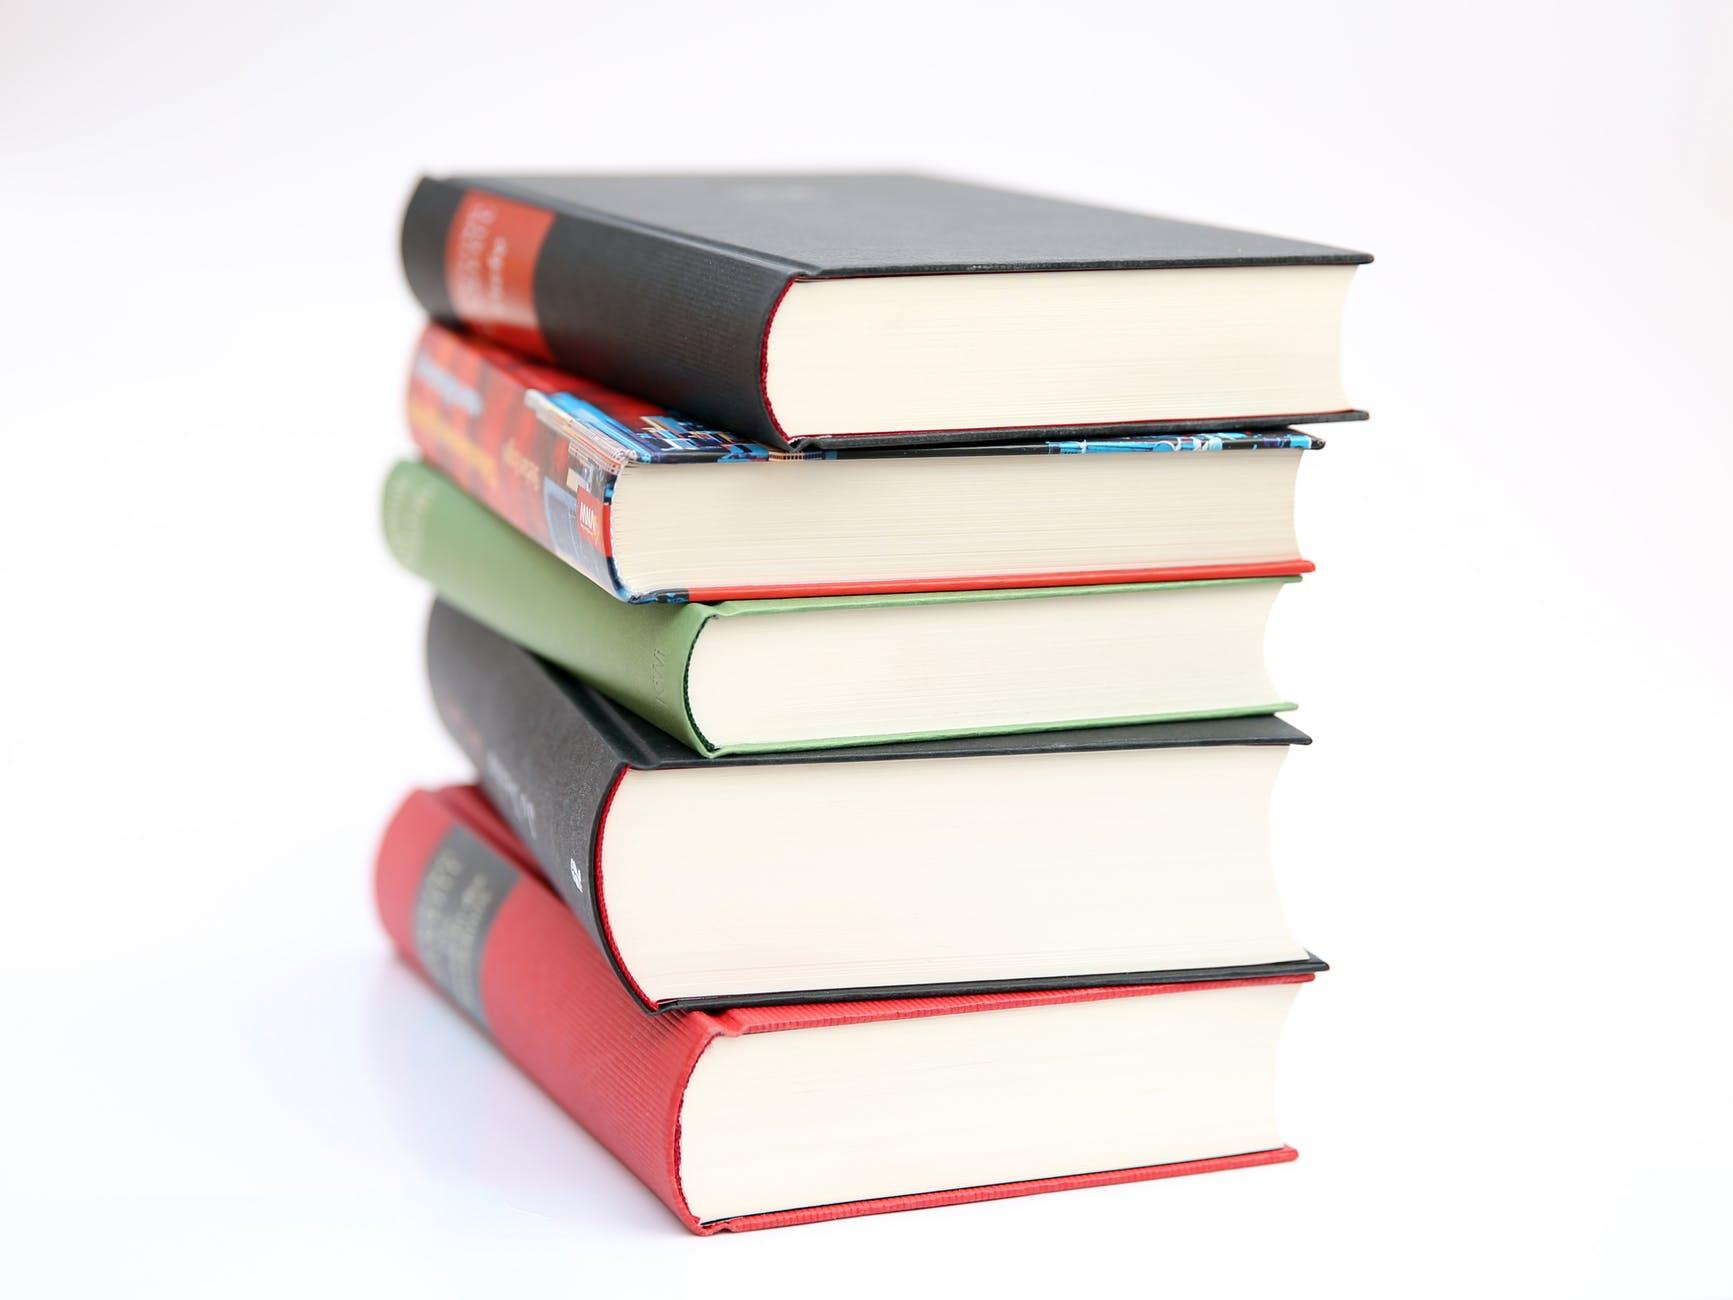 books-education-school-literature-51342